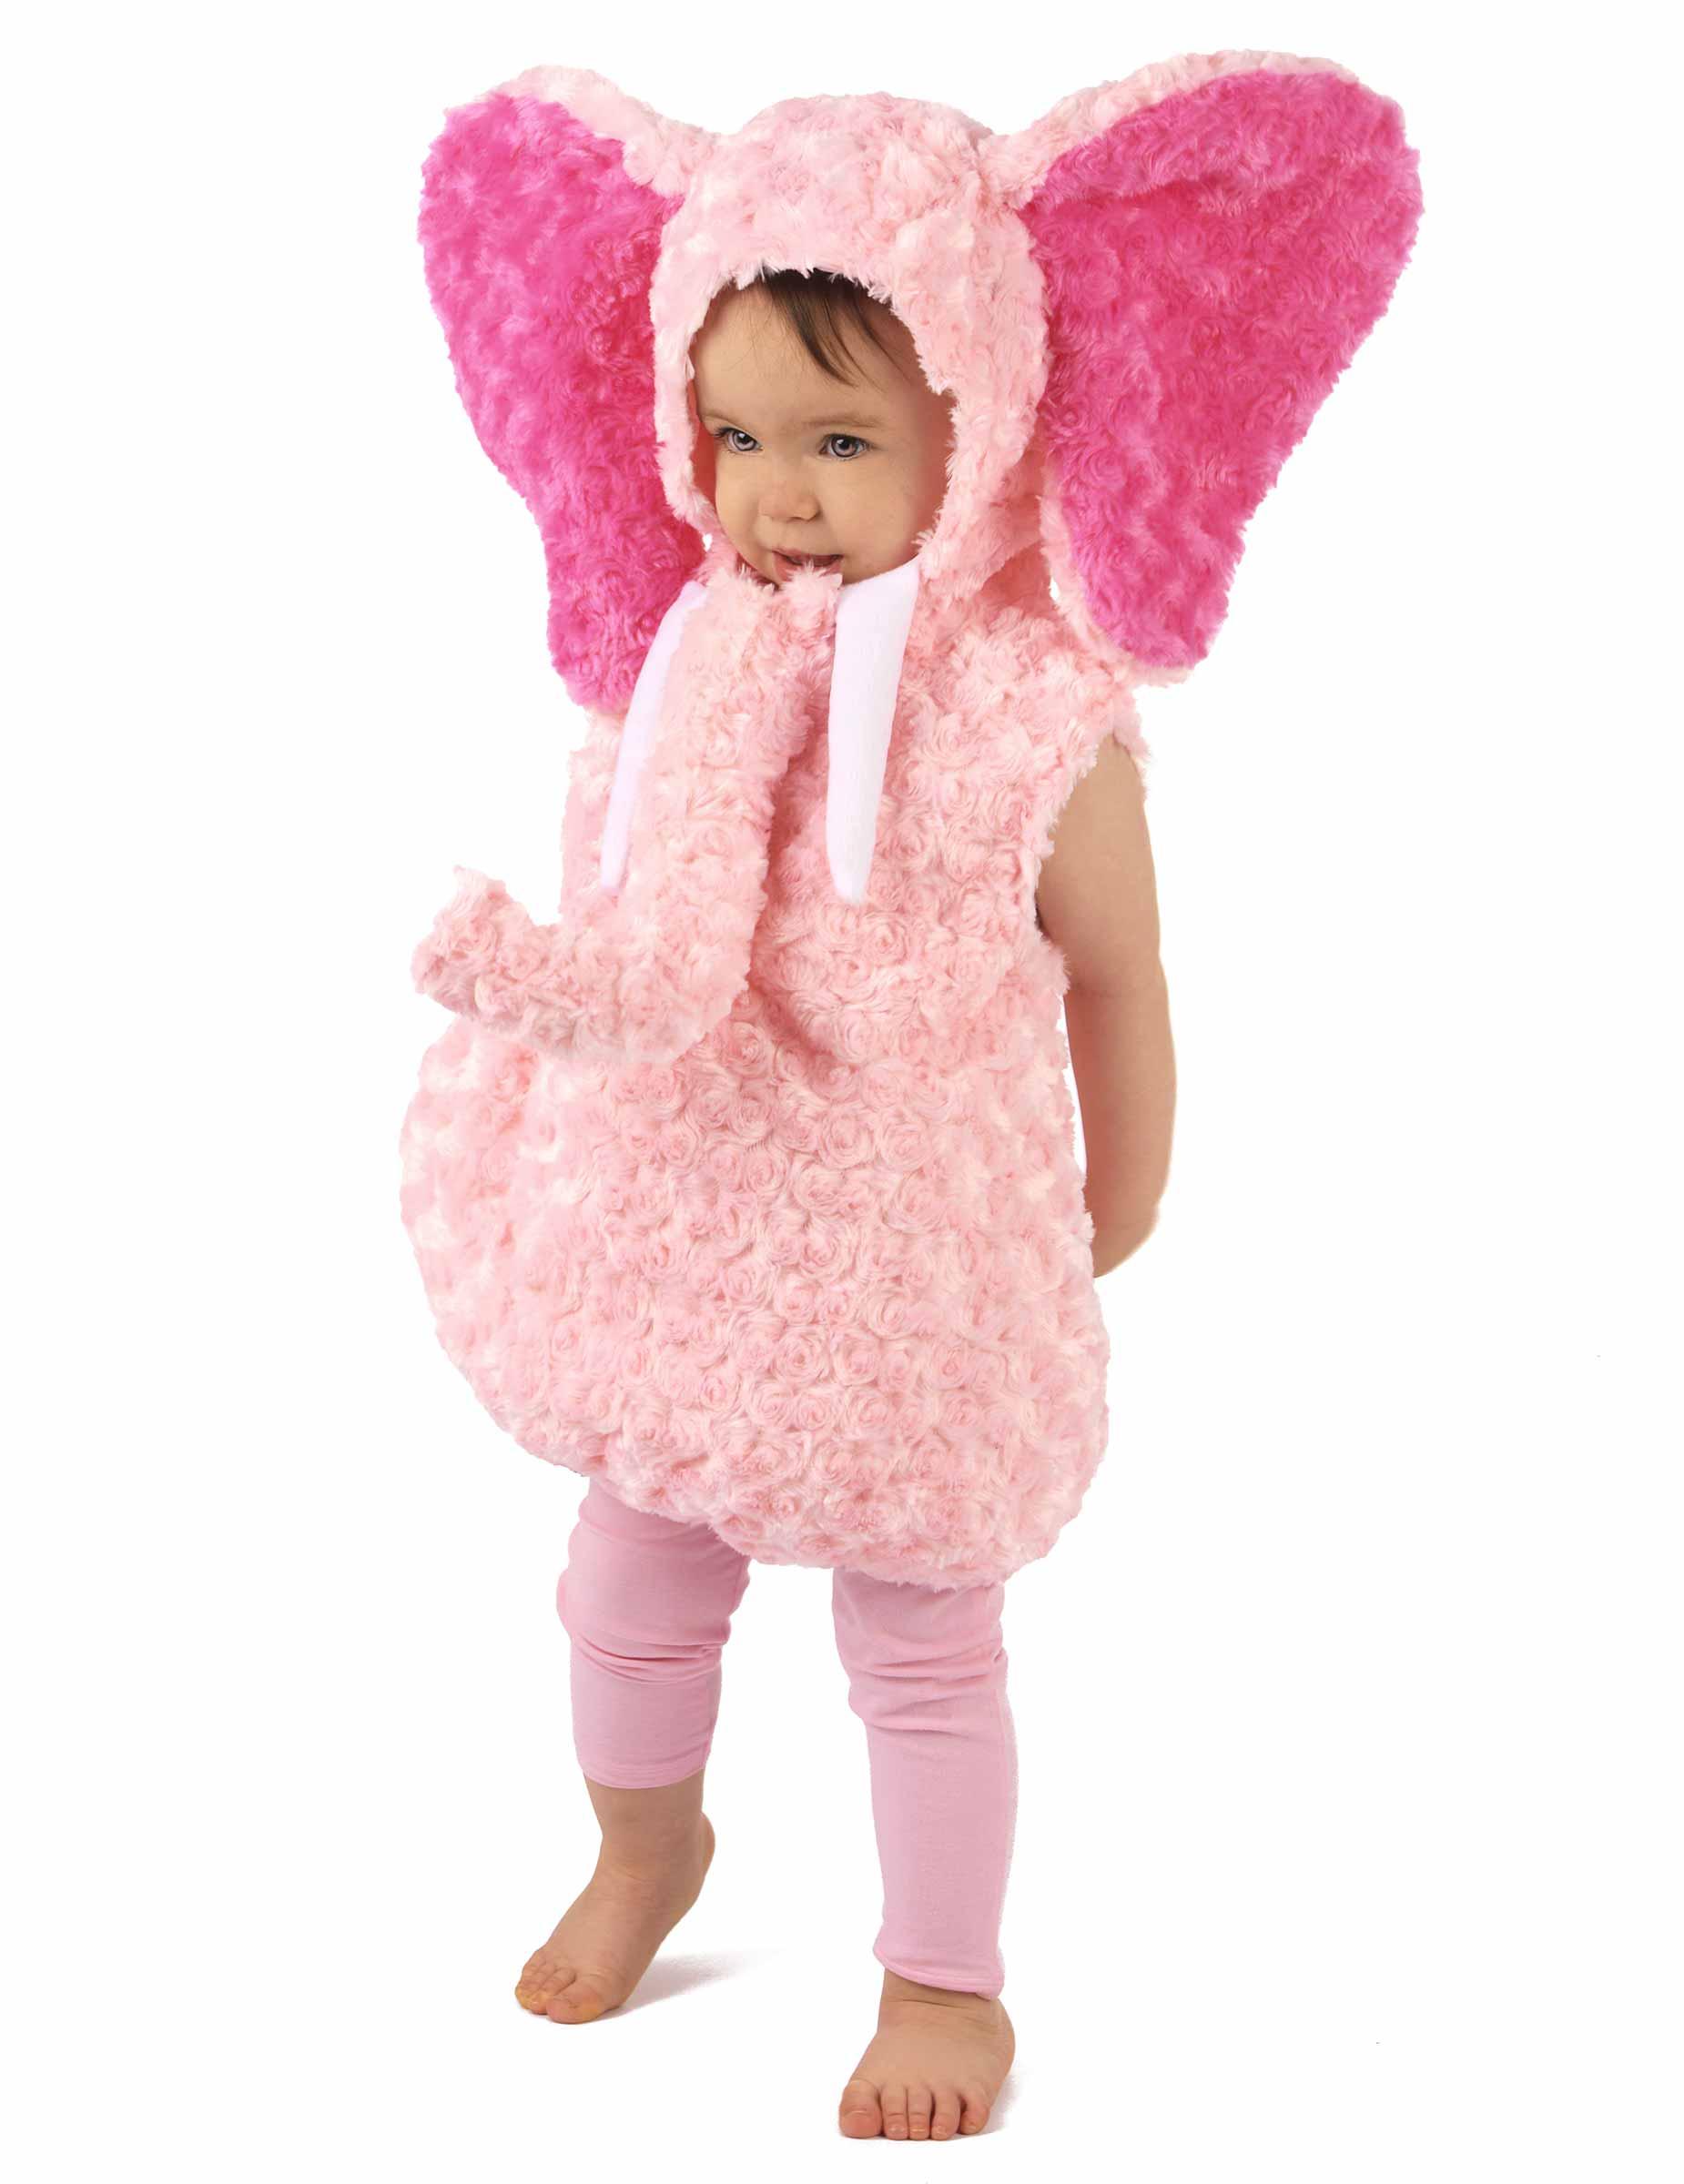 c190698d3bf Kostume lyserød elefant til børn